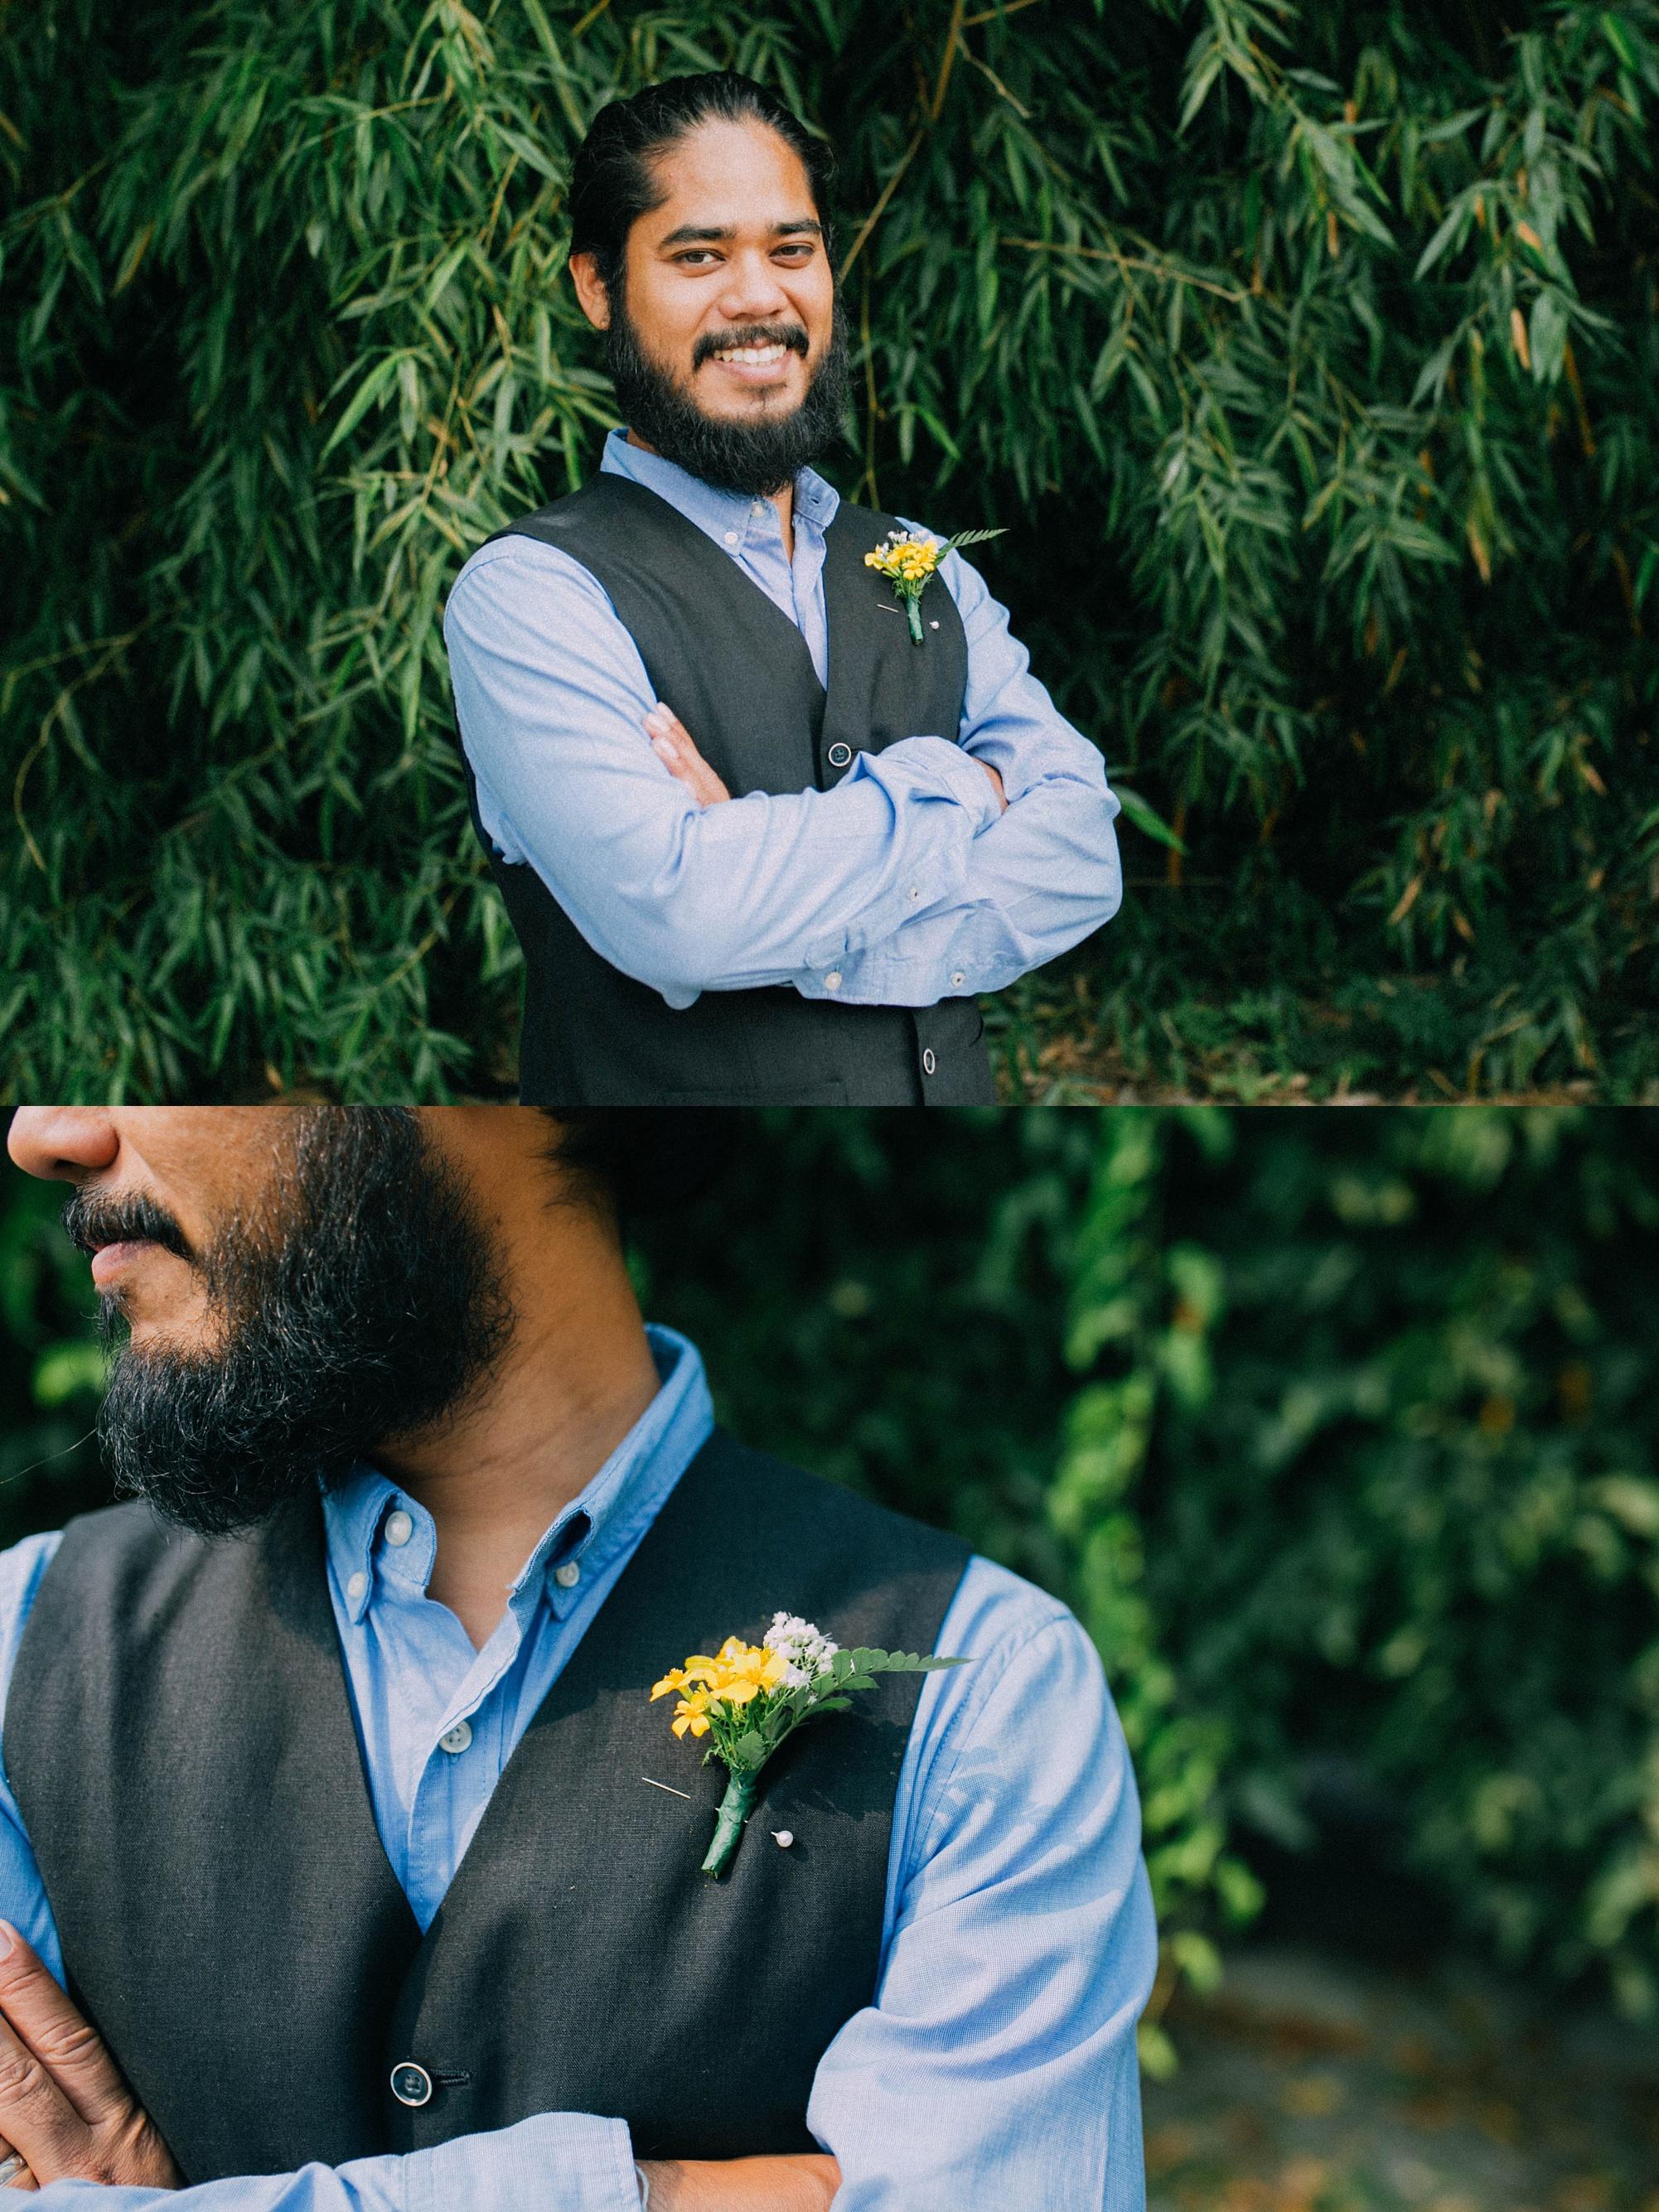 ashley_vos_seattle_ wedding_photographer_0458.jpg